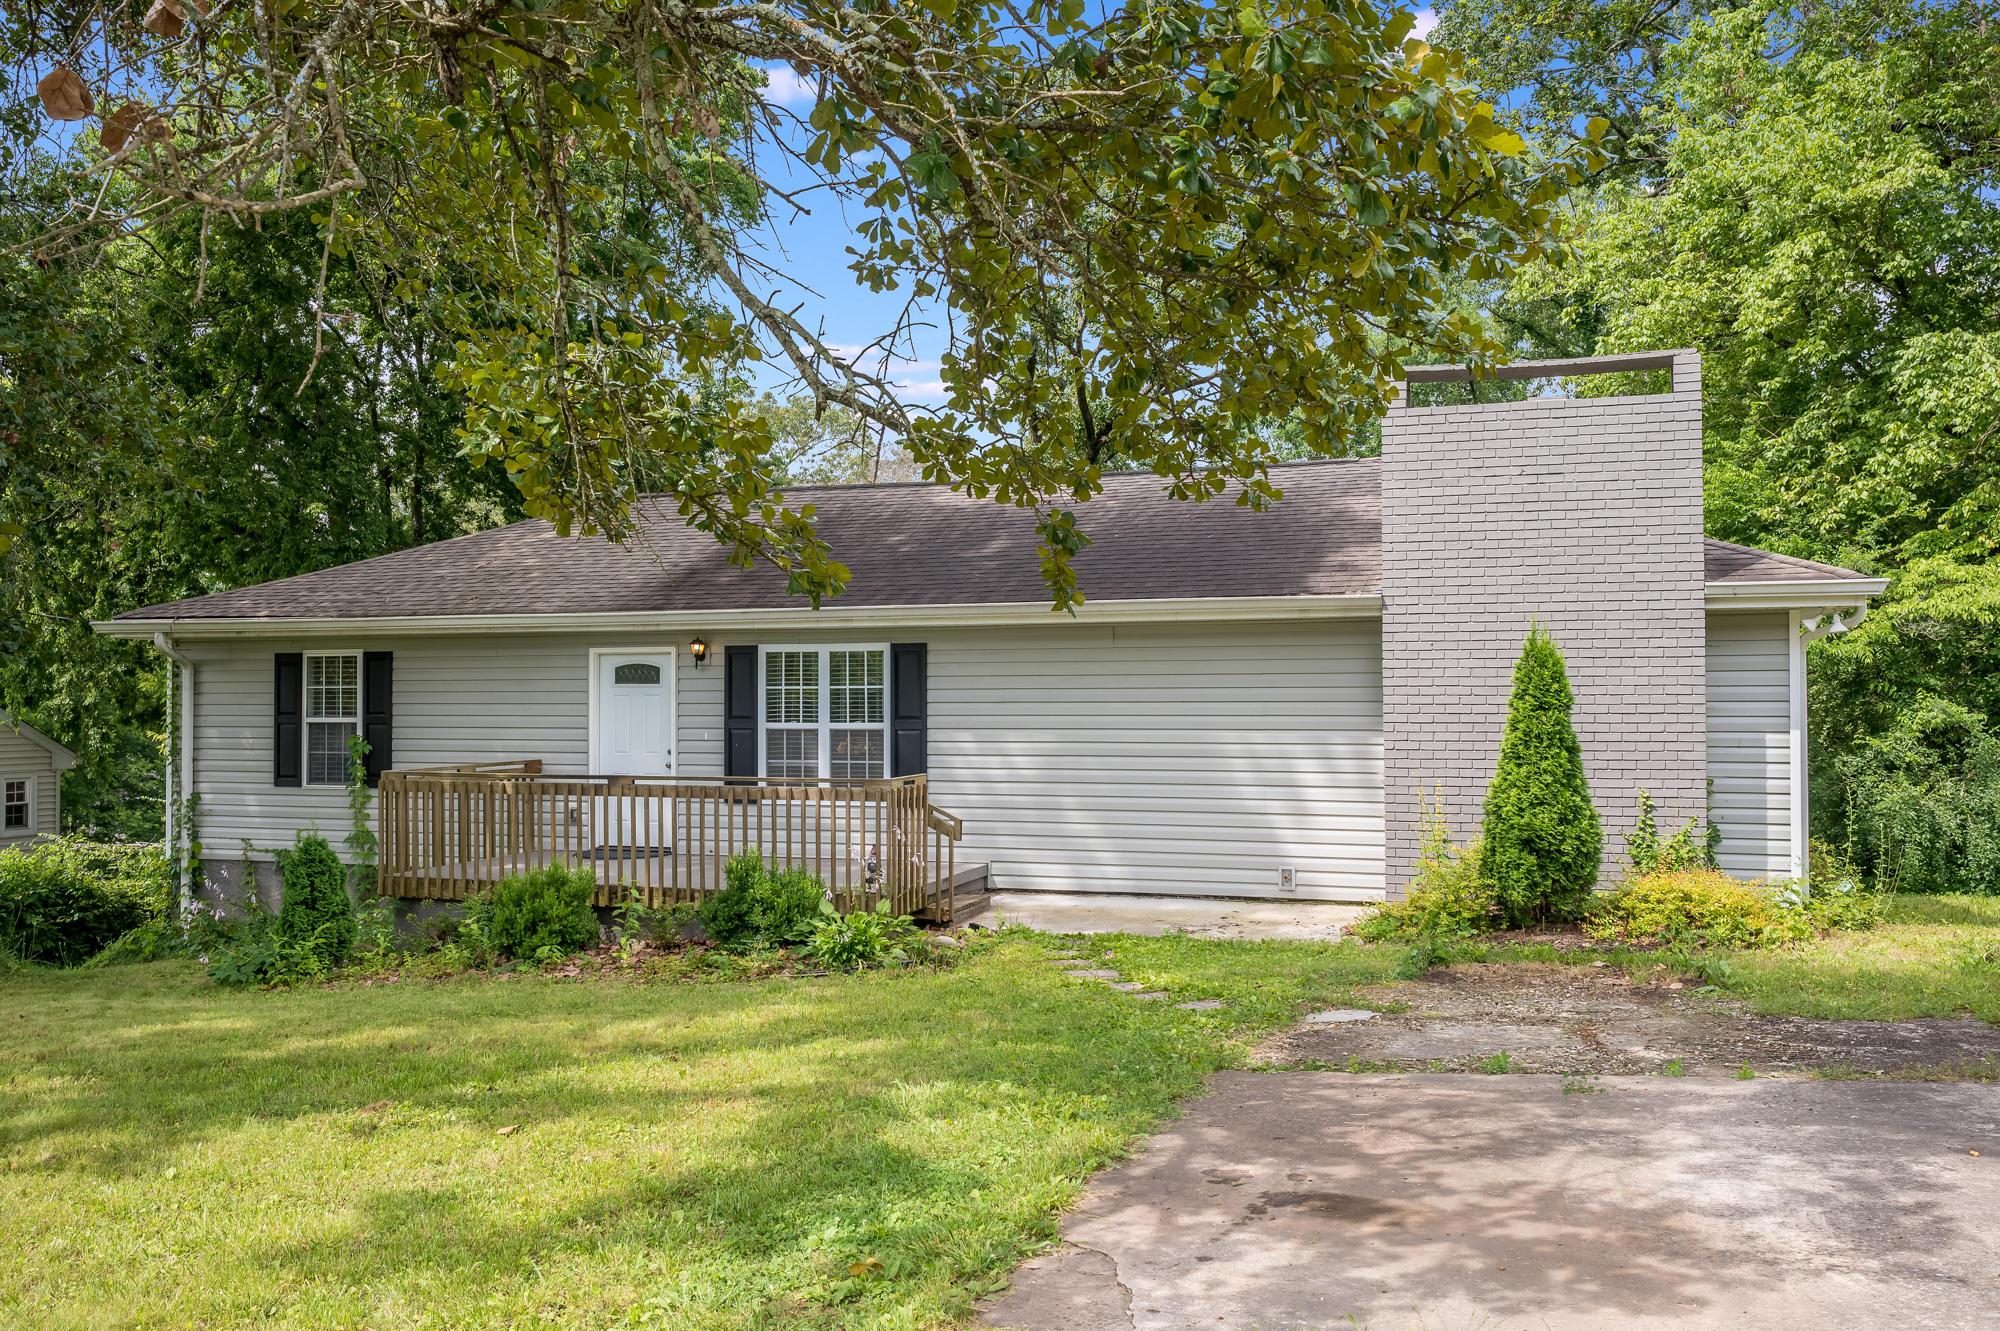 720 Mauldeth Rd, Chattanooga, TN 37415